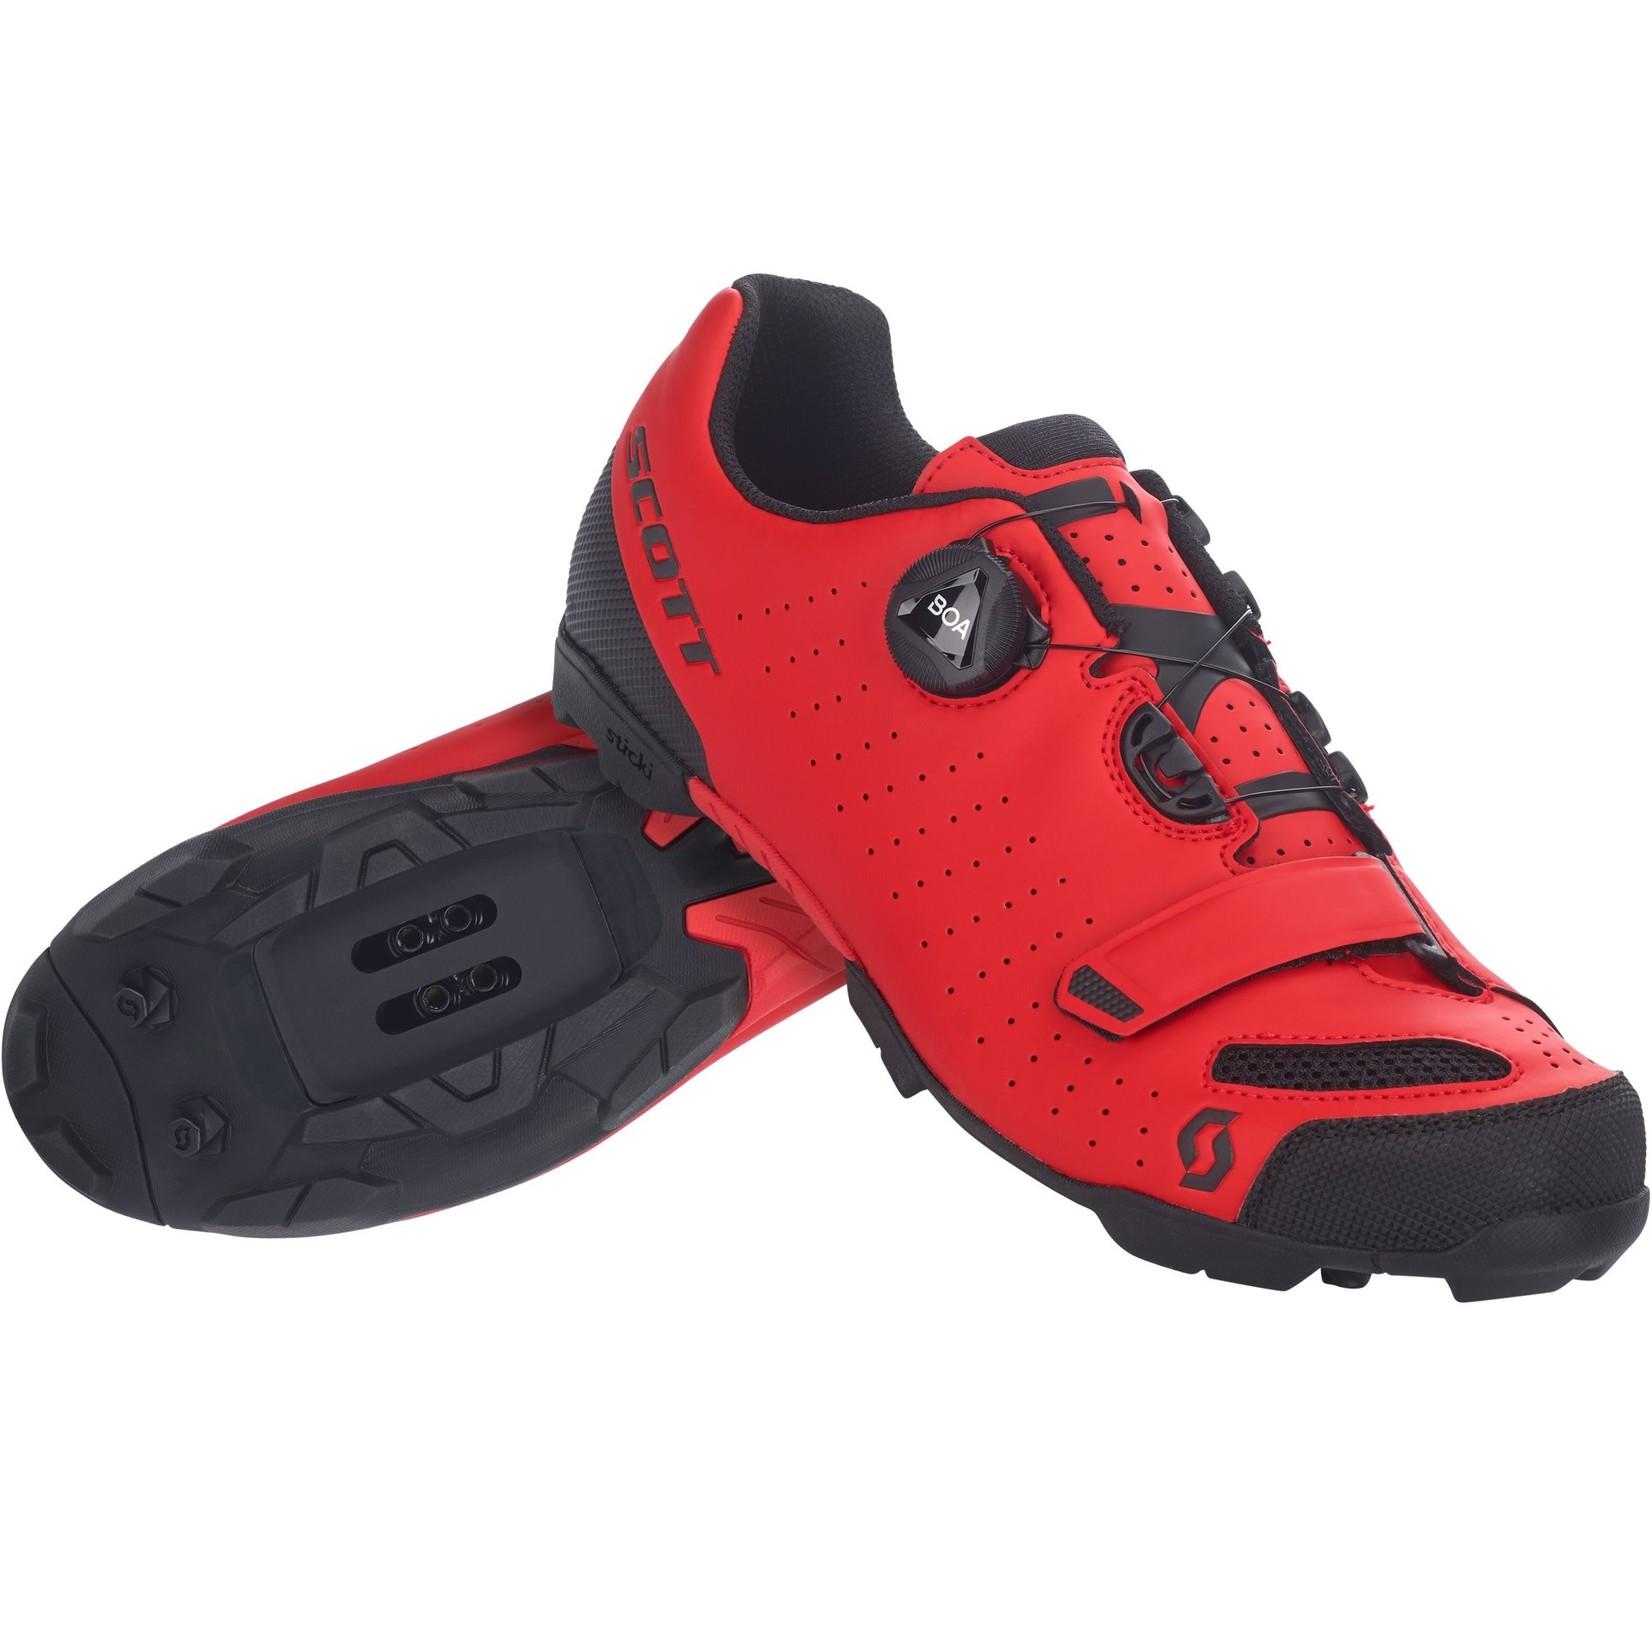 Scott SCO Shoe Mtb Comp Boa red/black 41.0 EU